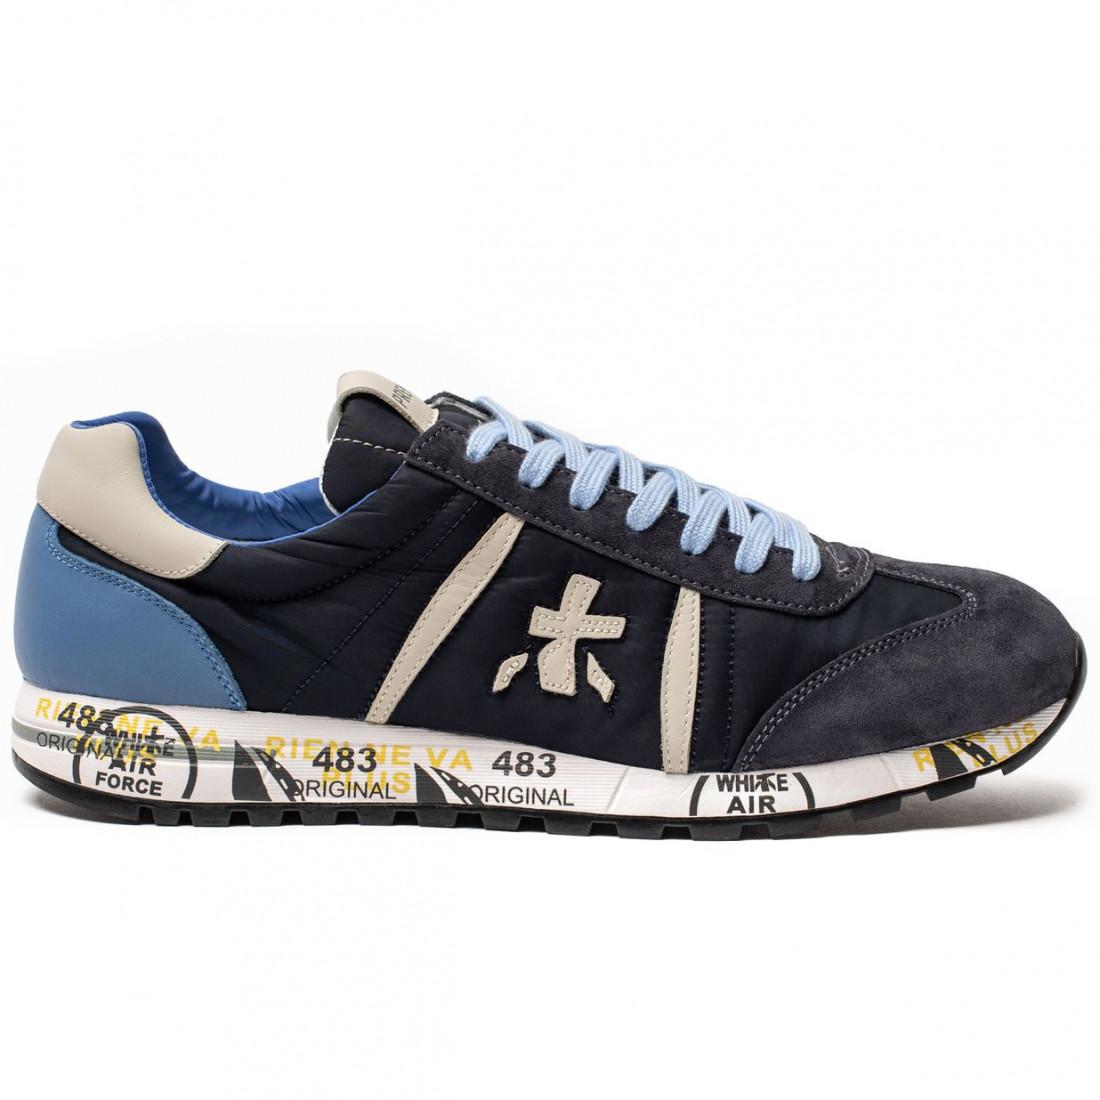 sneakers herren premiata lucy1298e 8298